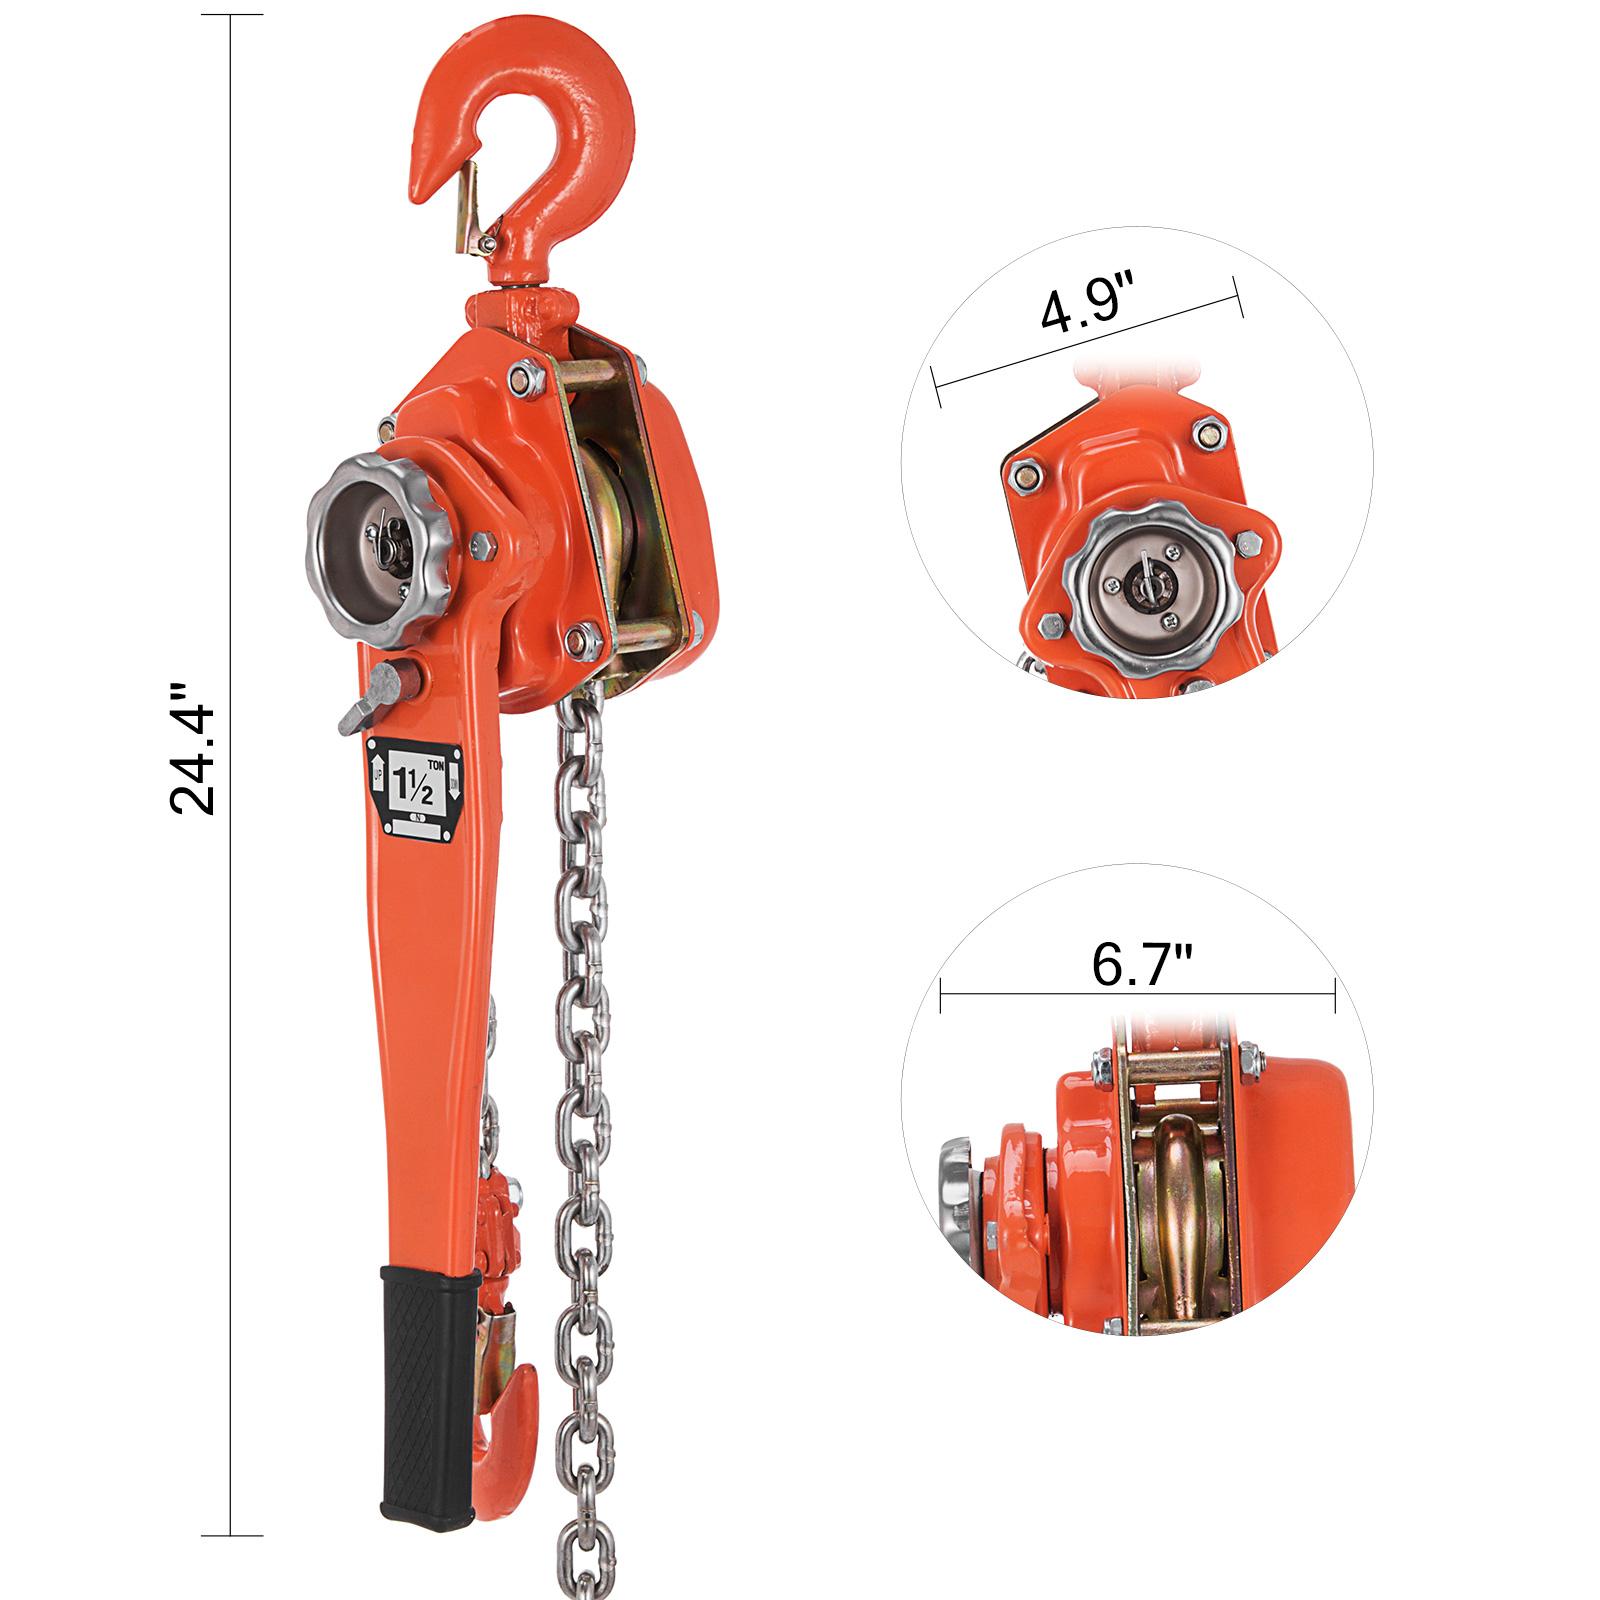 1-5T-Lever-Block-Chain-Hoist-1-5M-6M-Lift-Pull-Machinery-Gear-FACTORY-DISCOUNT thumbnail 38